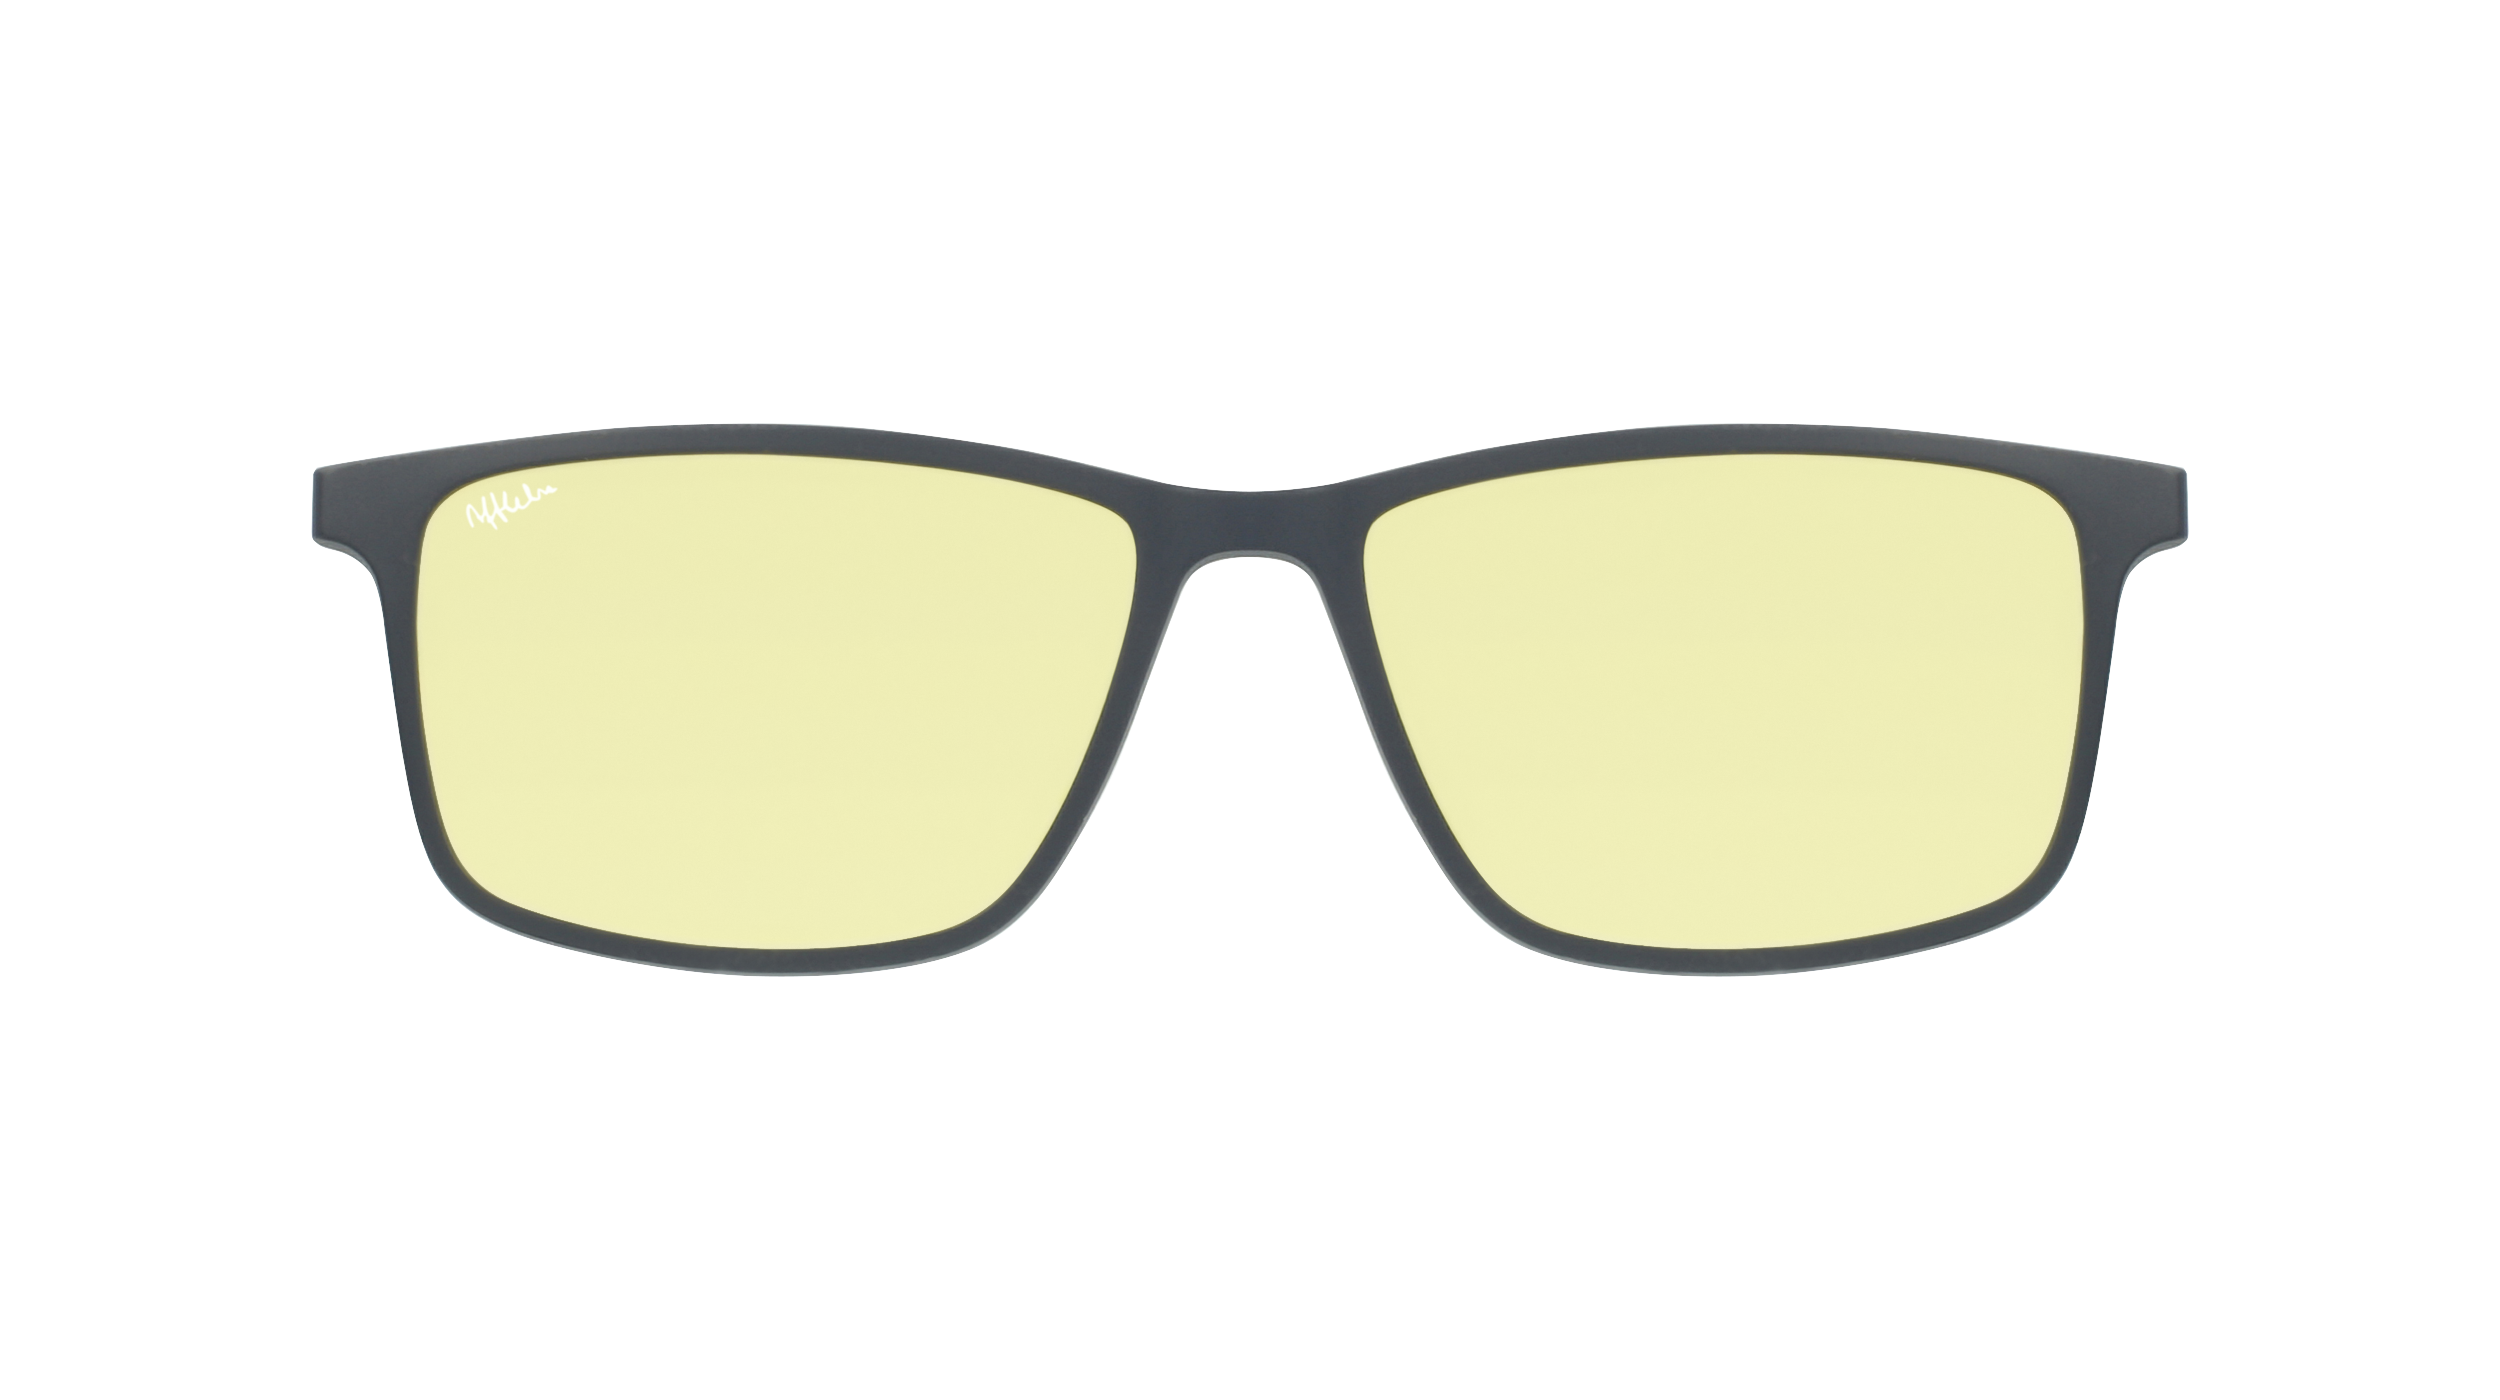 afflelou/france/products/smart_clip/clips_glasses/07630036457085.png